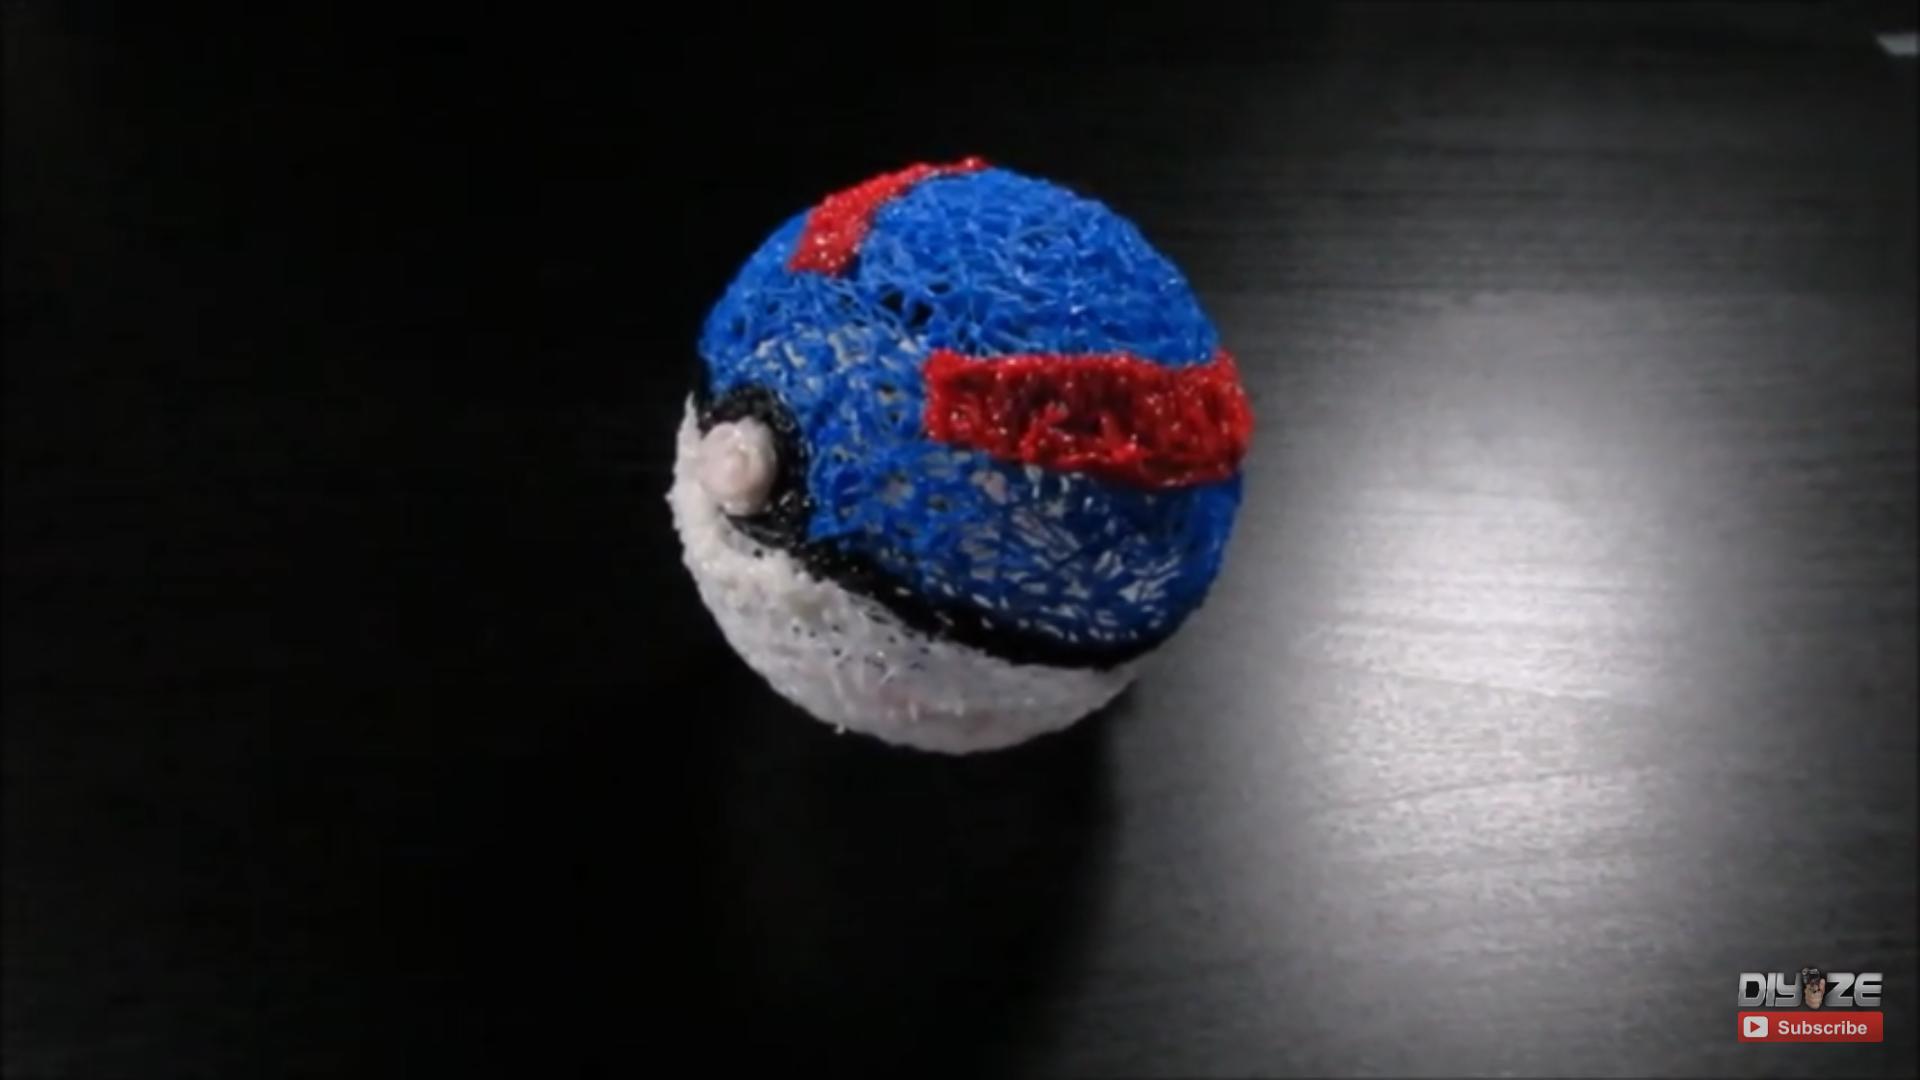 DIY Pokeball using 3D pen